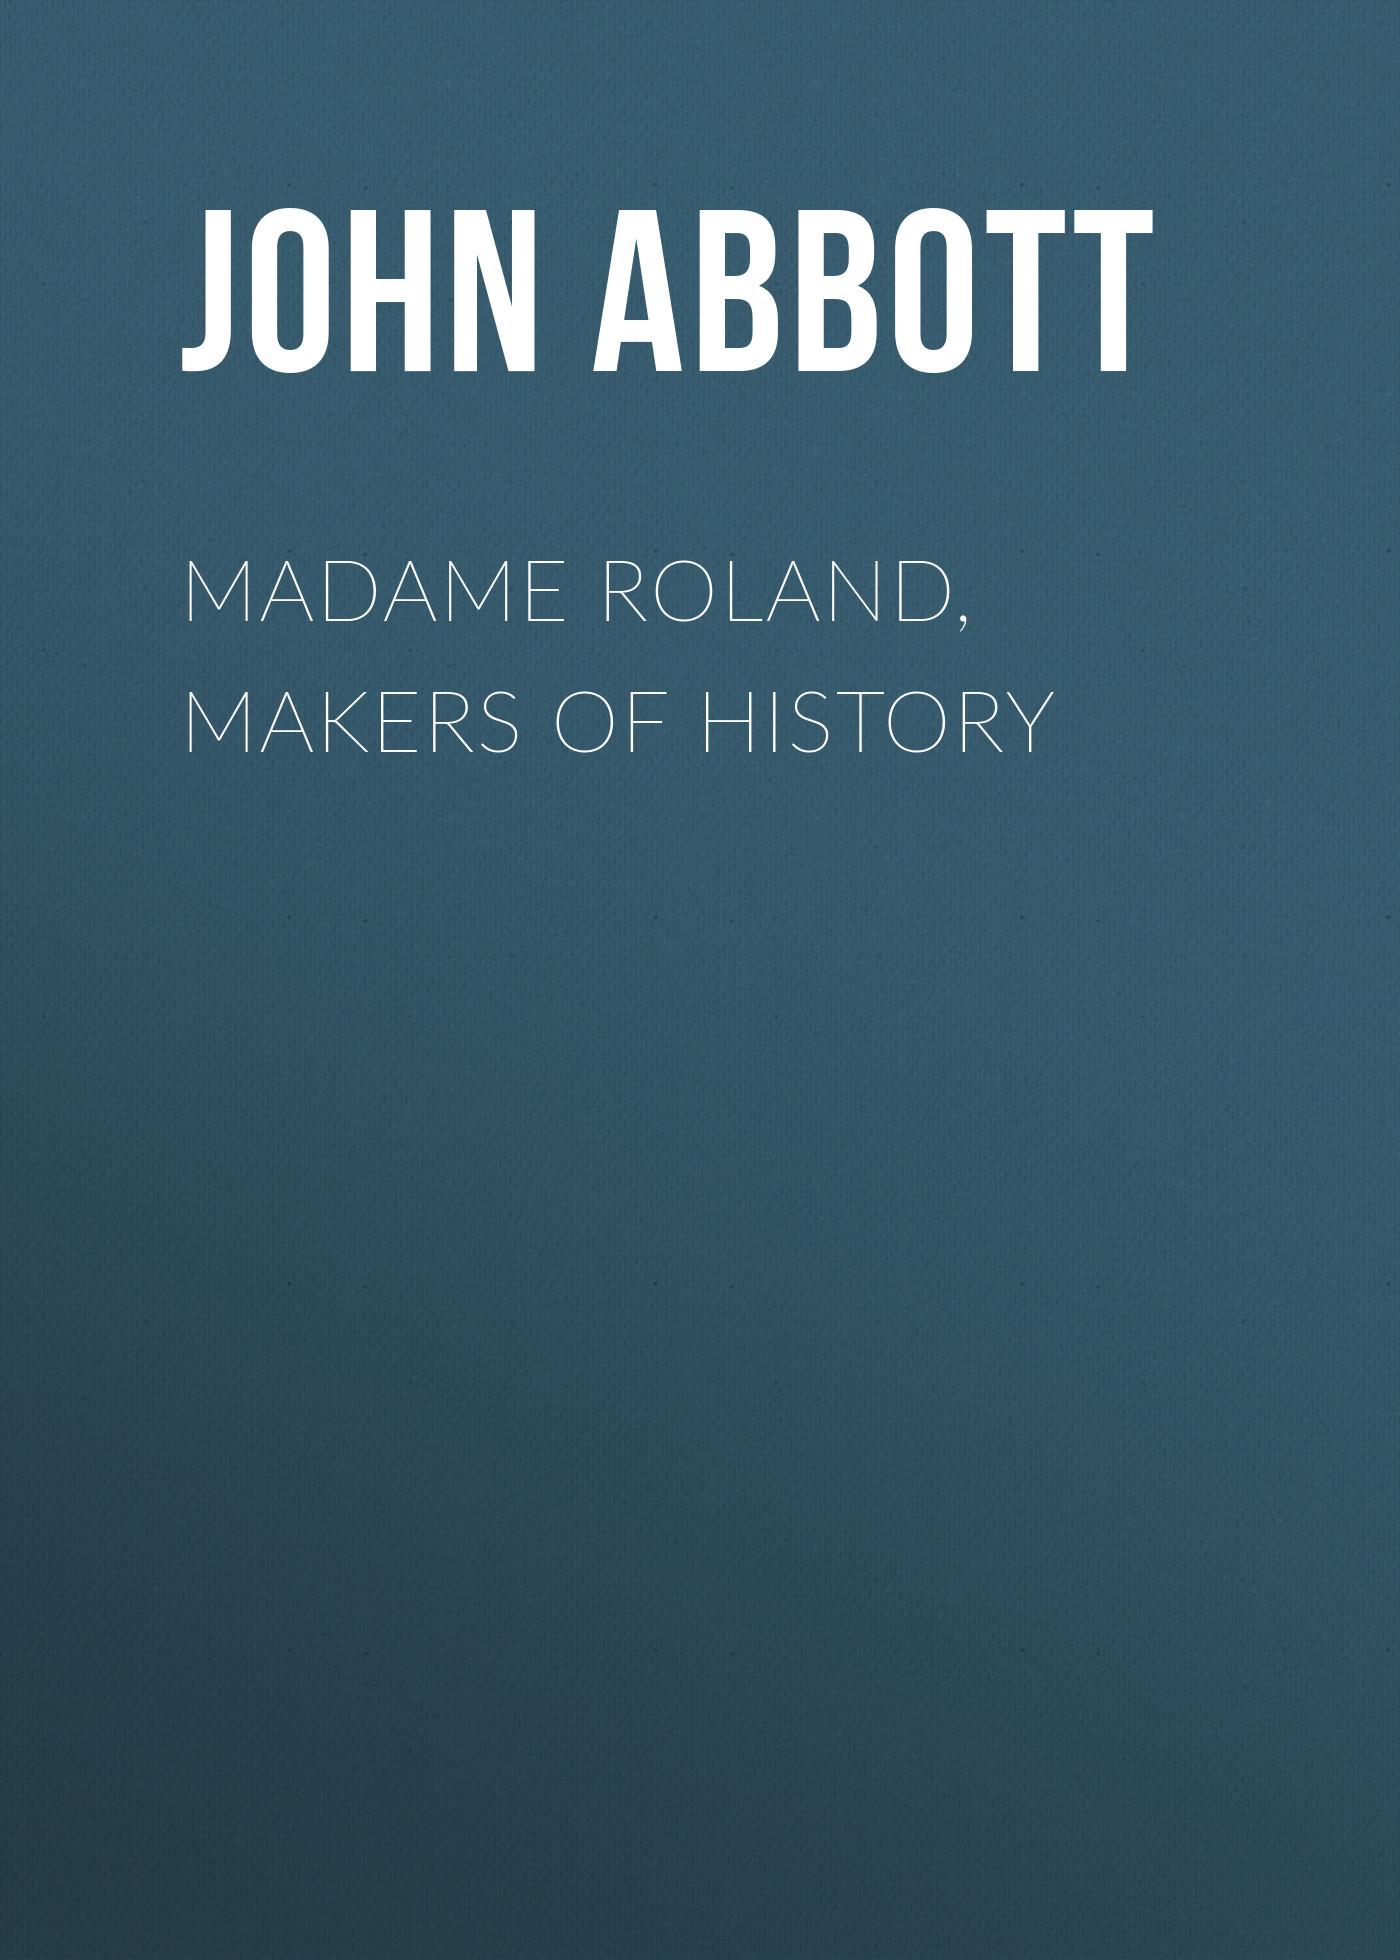 Abbott John Stevens Cabot Madame Roland, Makers of History